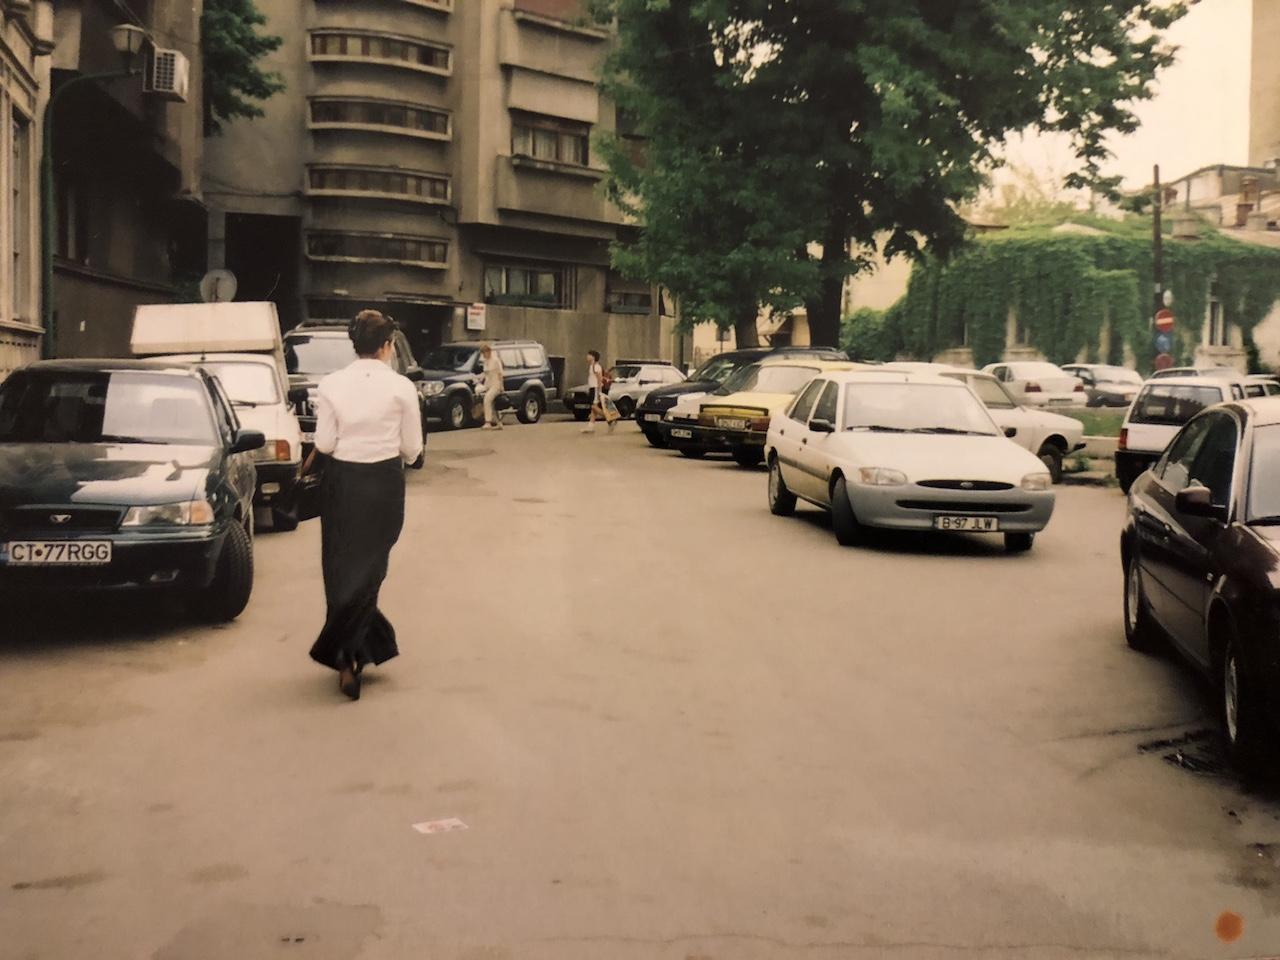 Strada Stelea Spatarul, mai 2003, perioada Saatchi & Saatchi